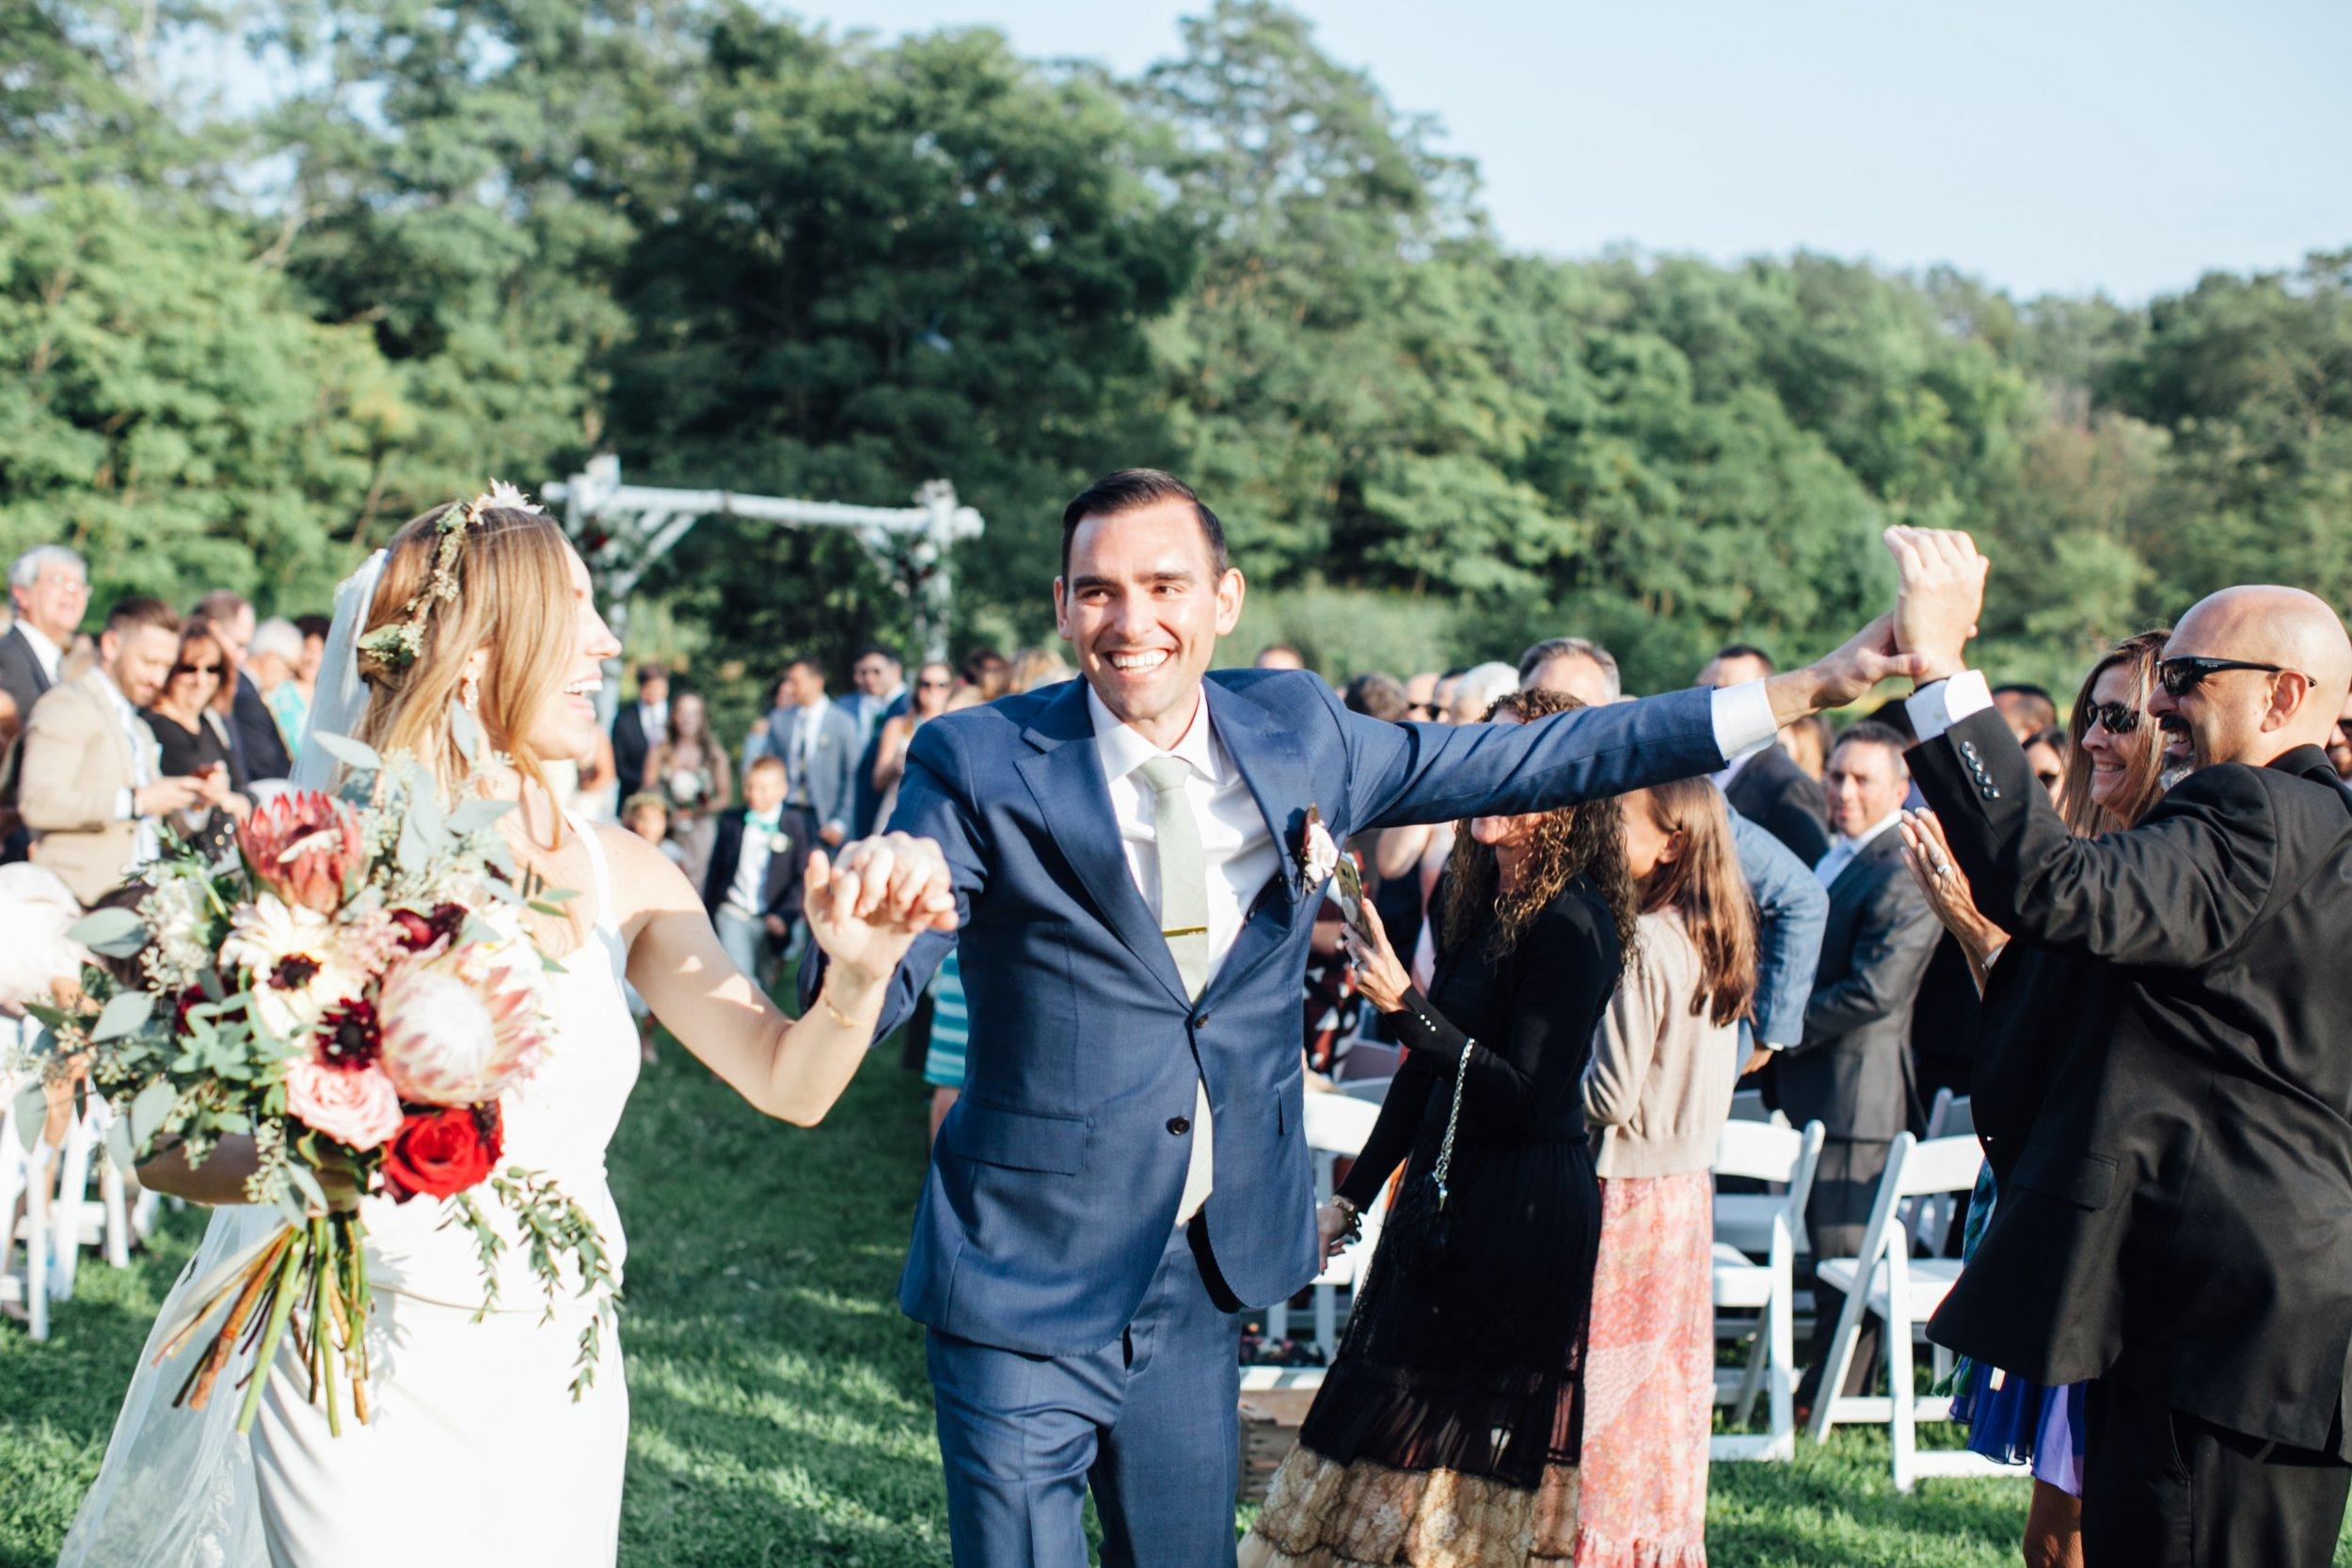 Courtney + Matt Blenheim Hill Farm Catskills NY Wedding Veronica Lola Photography 2017-439.jpg